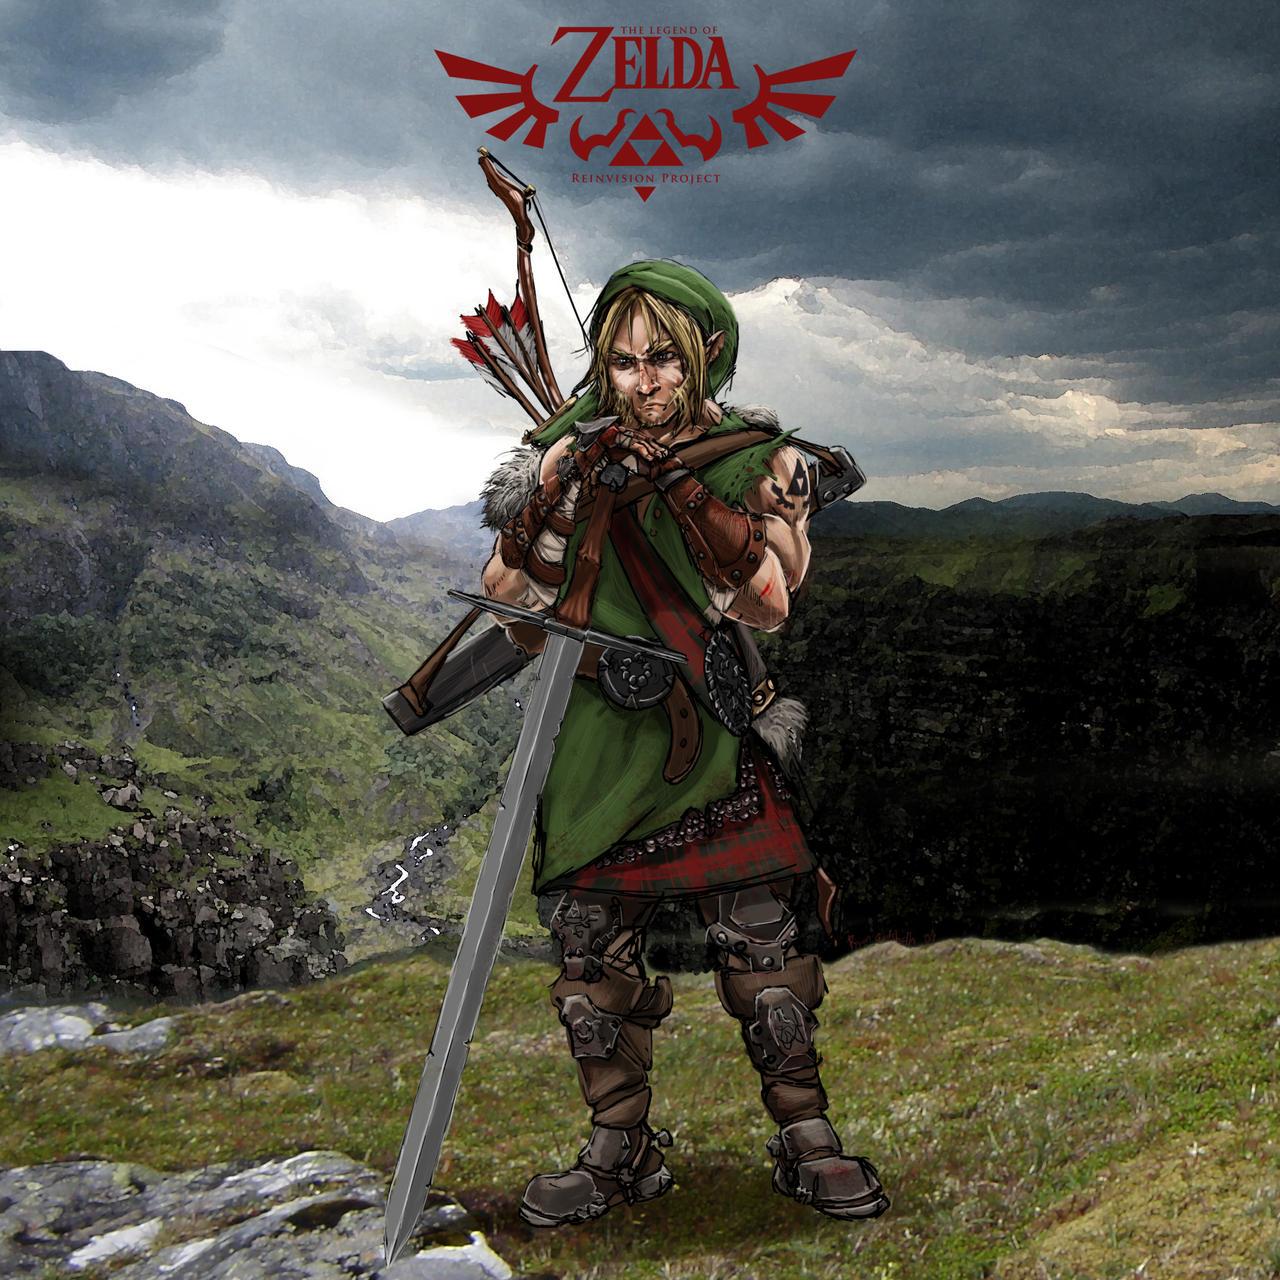 Legend of Zelda: Link Concept